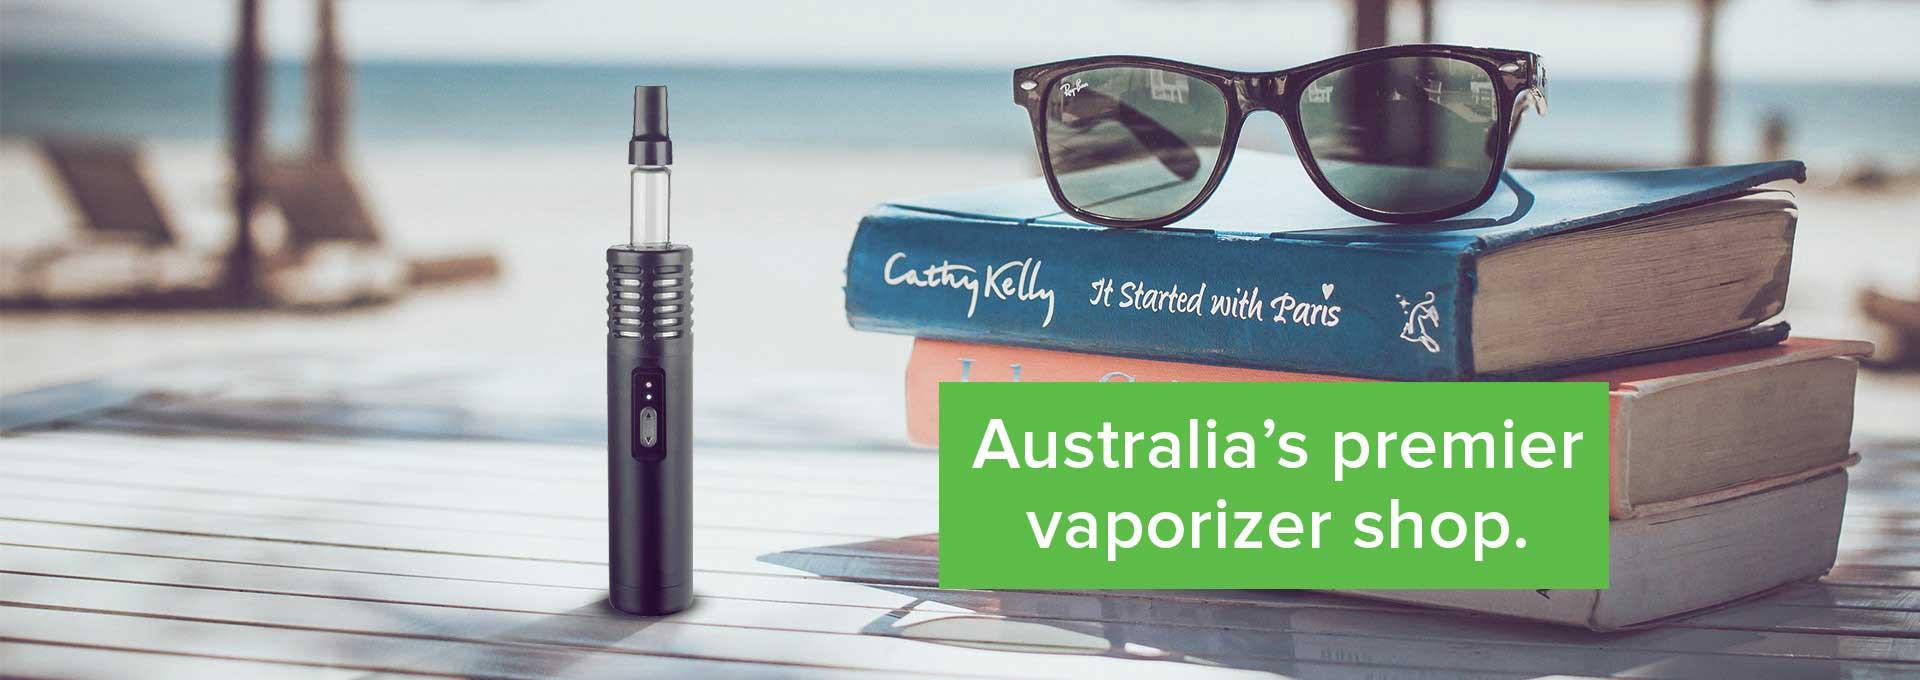 australias vaporizer shop